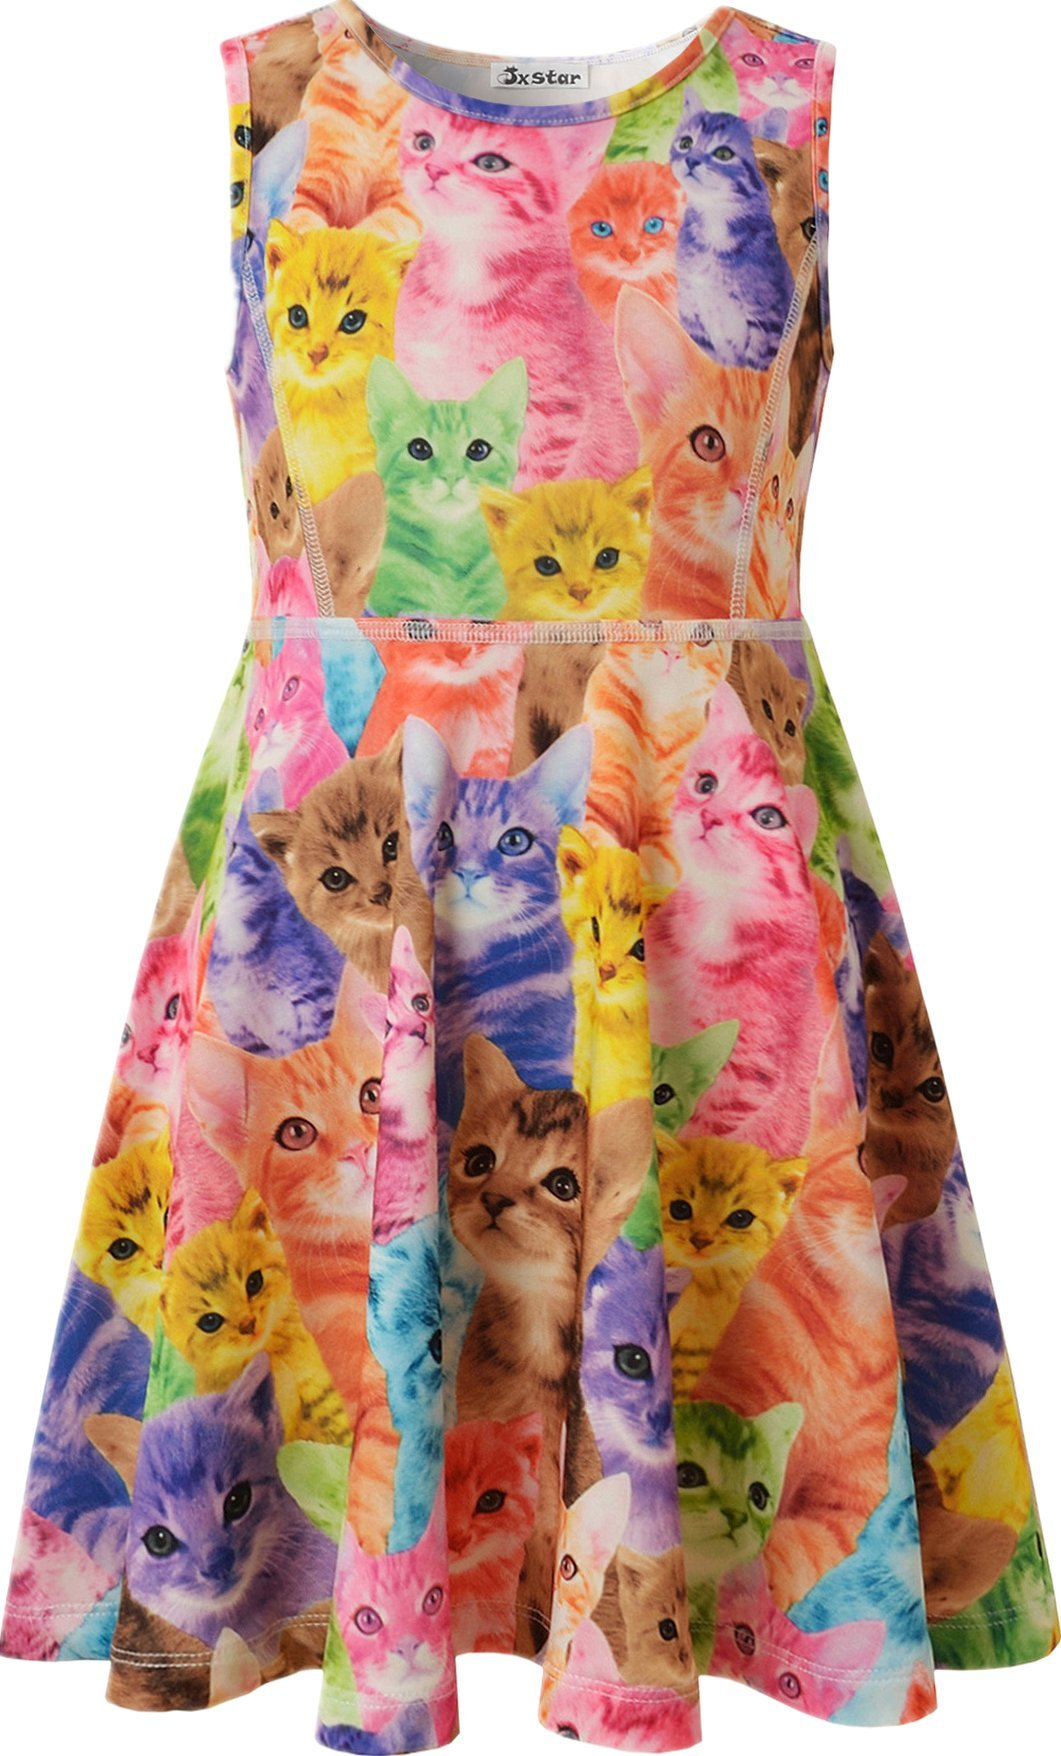 Jxstar Cat Party Supplies Girls Dresses Size 6 Little Girl Dress Girls Clothes Size 7 Elementary School Cat 130